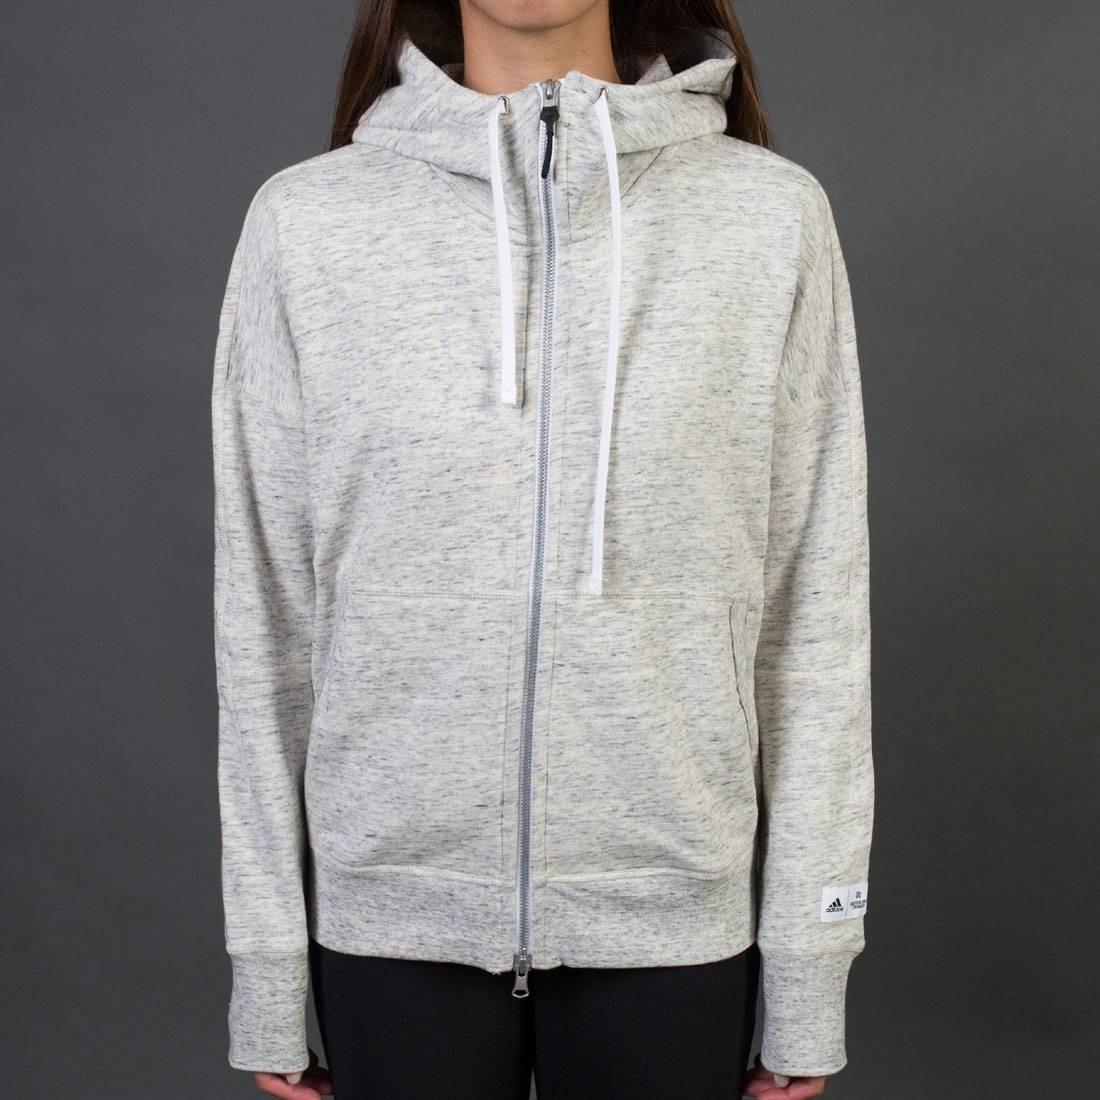 Adidas x Reigning Champ Women AARC FTFZ Hoodie (white / heather grey)